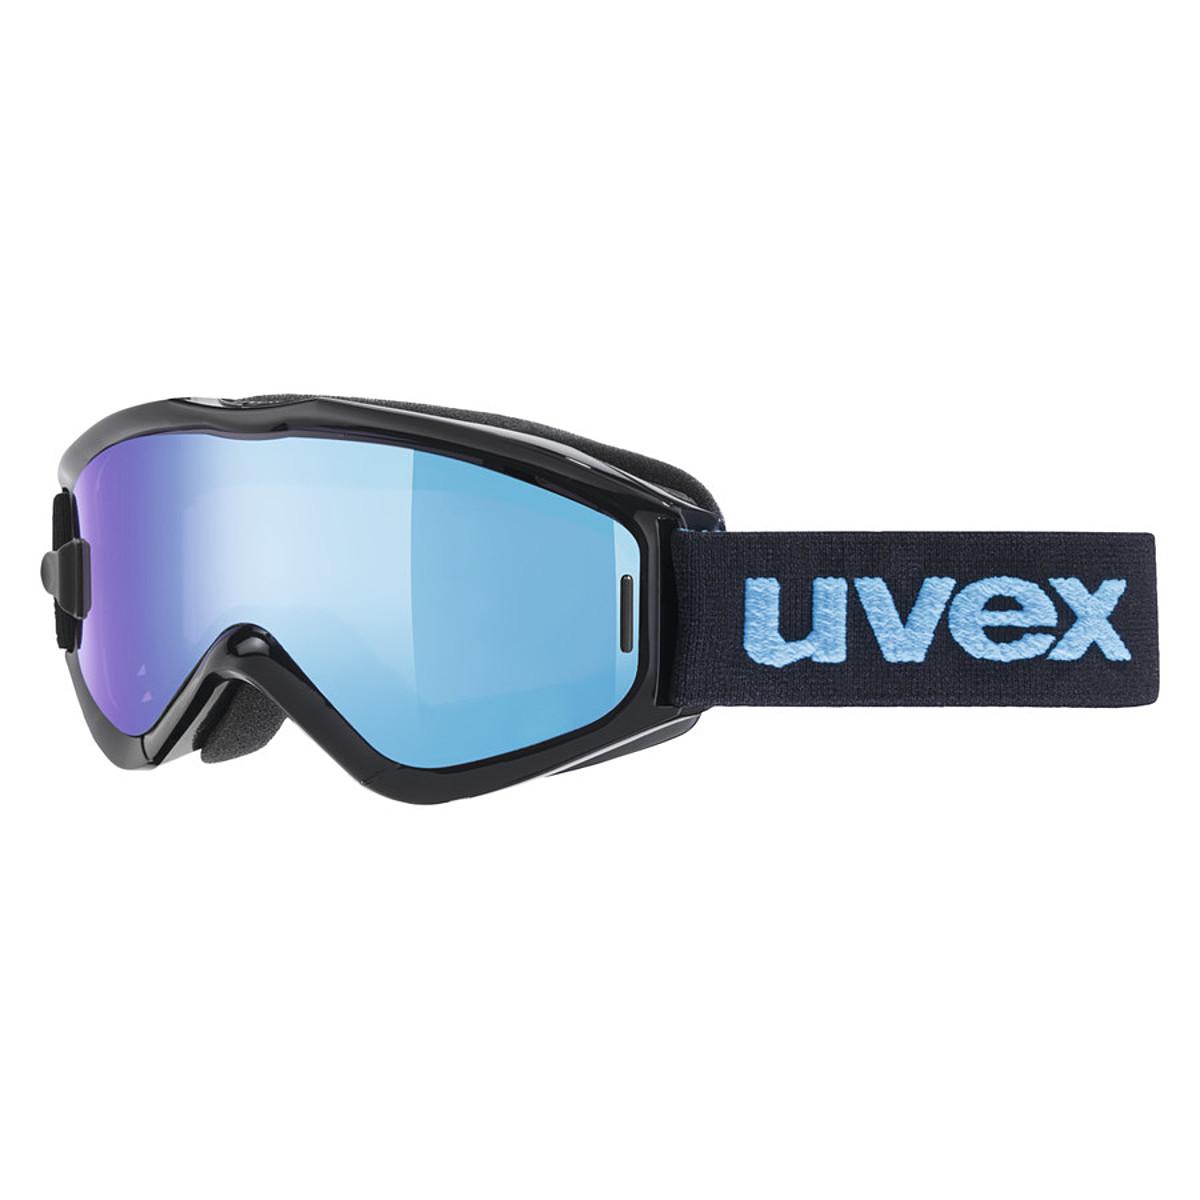 Uvex Speedy Pro Take Off Goggle